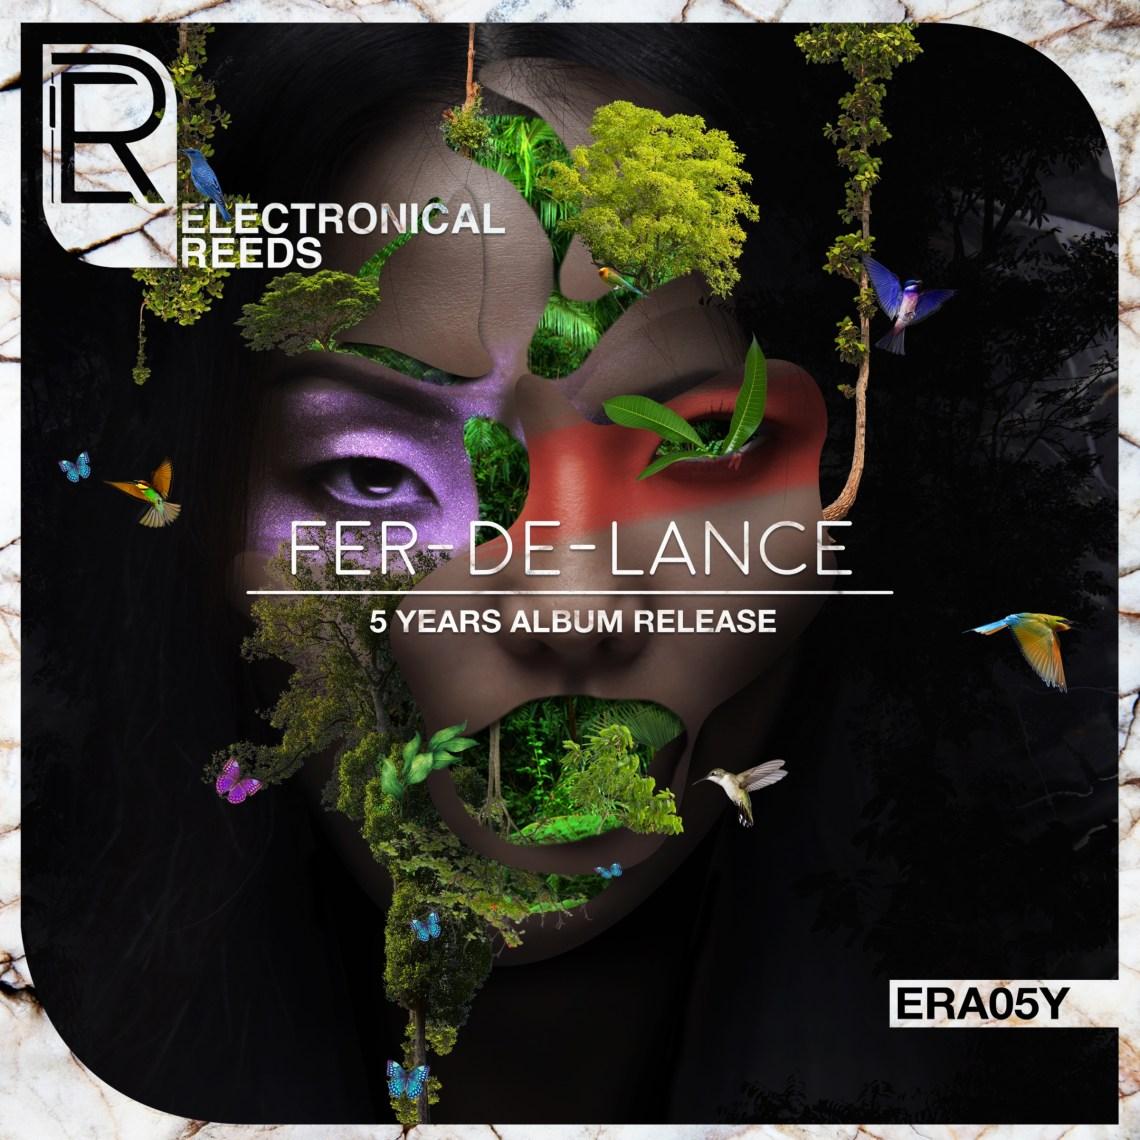 ERA05Y - Various Artists - Fer-de-Lance - 5 Years Album Release - Electronical Reeds